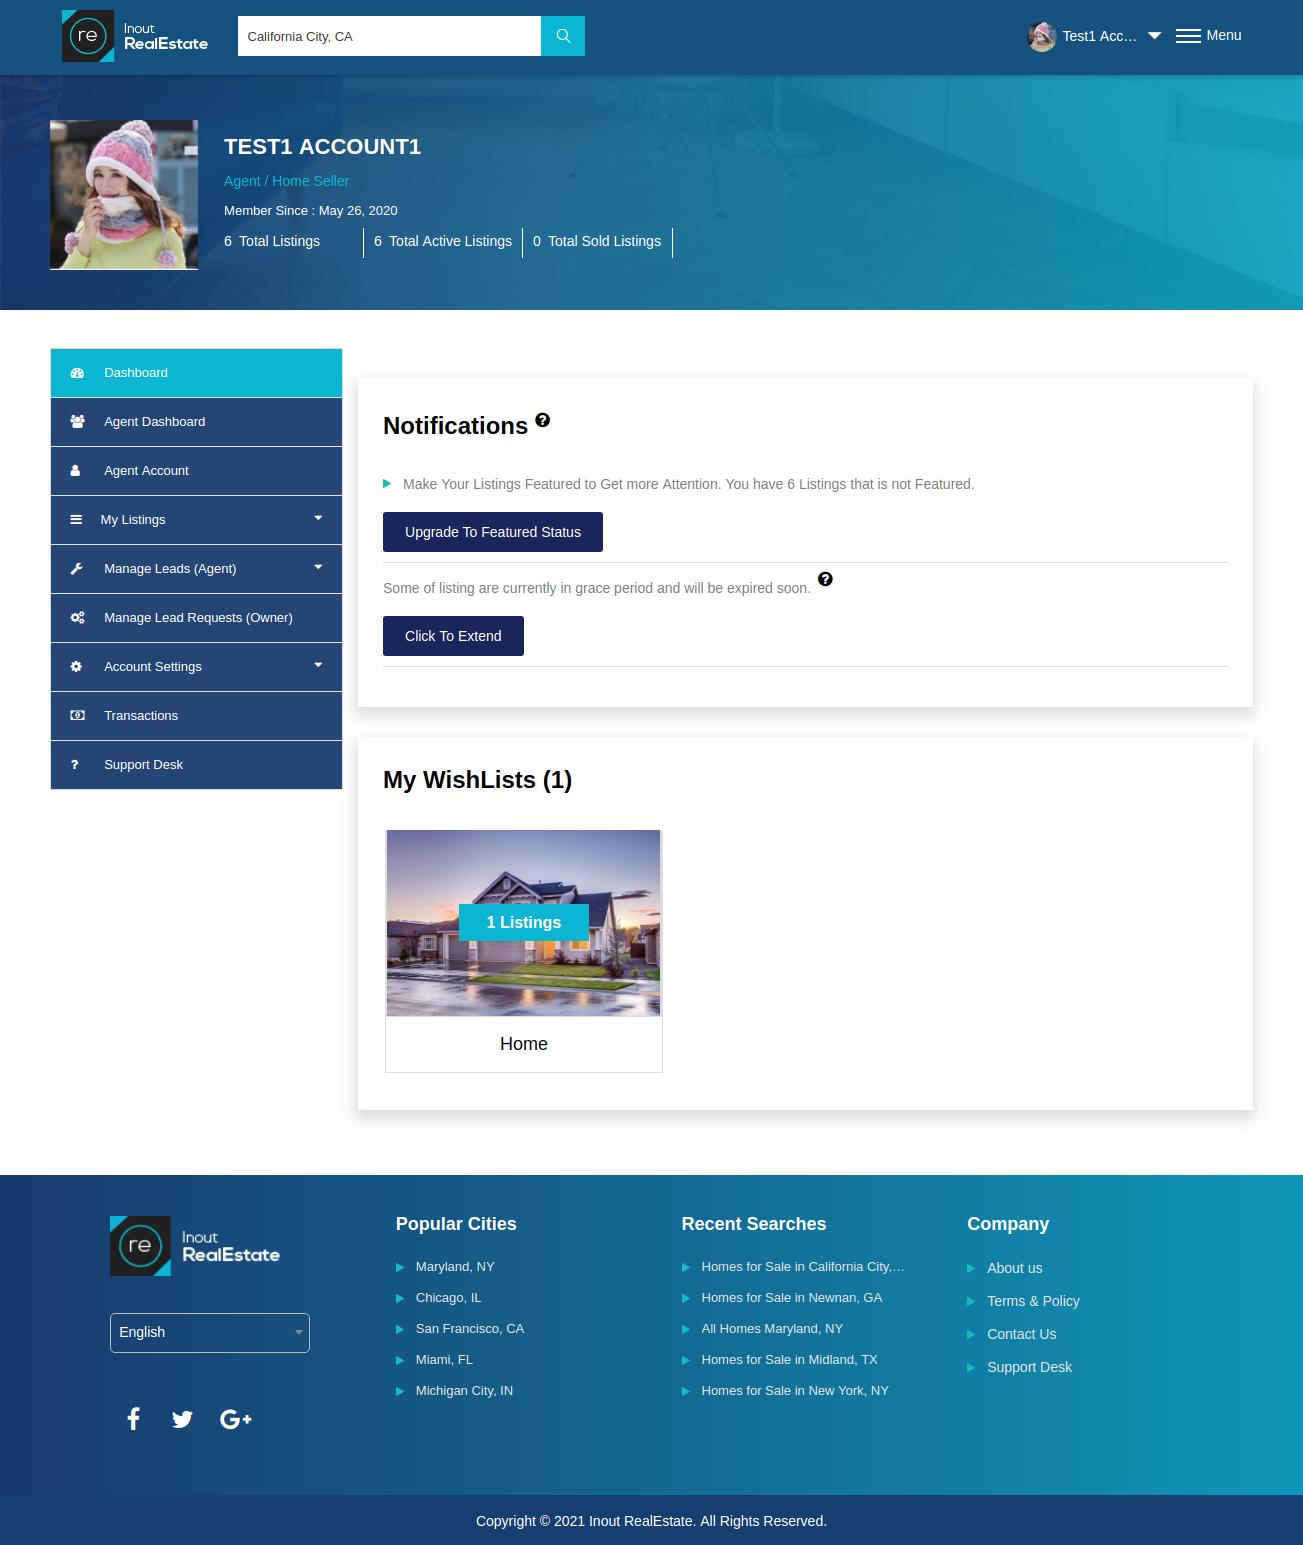 Inout RealEstate - Map Based Advanced Real Estate Portal - Screenshot 4